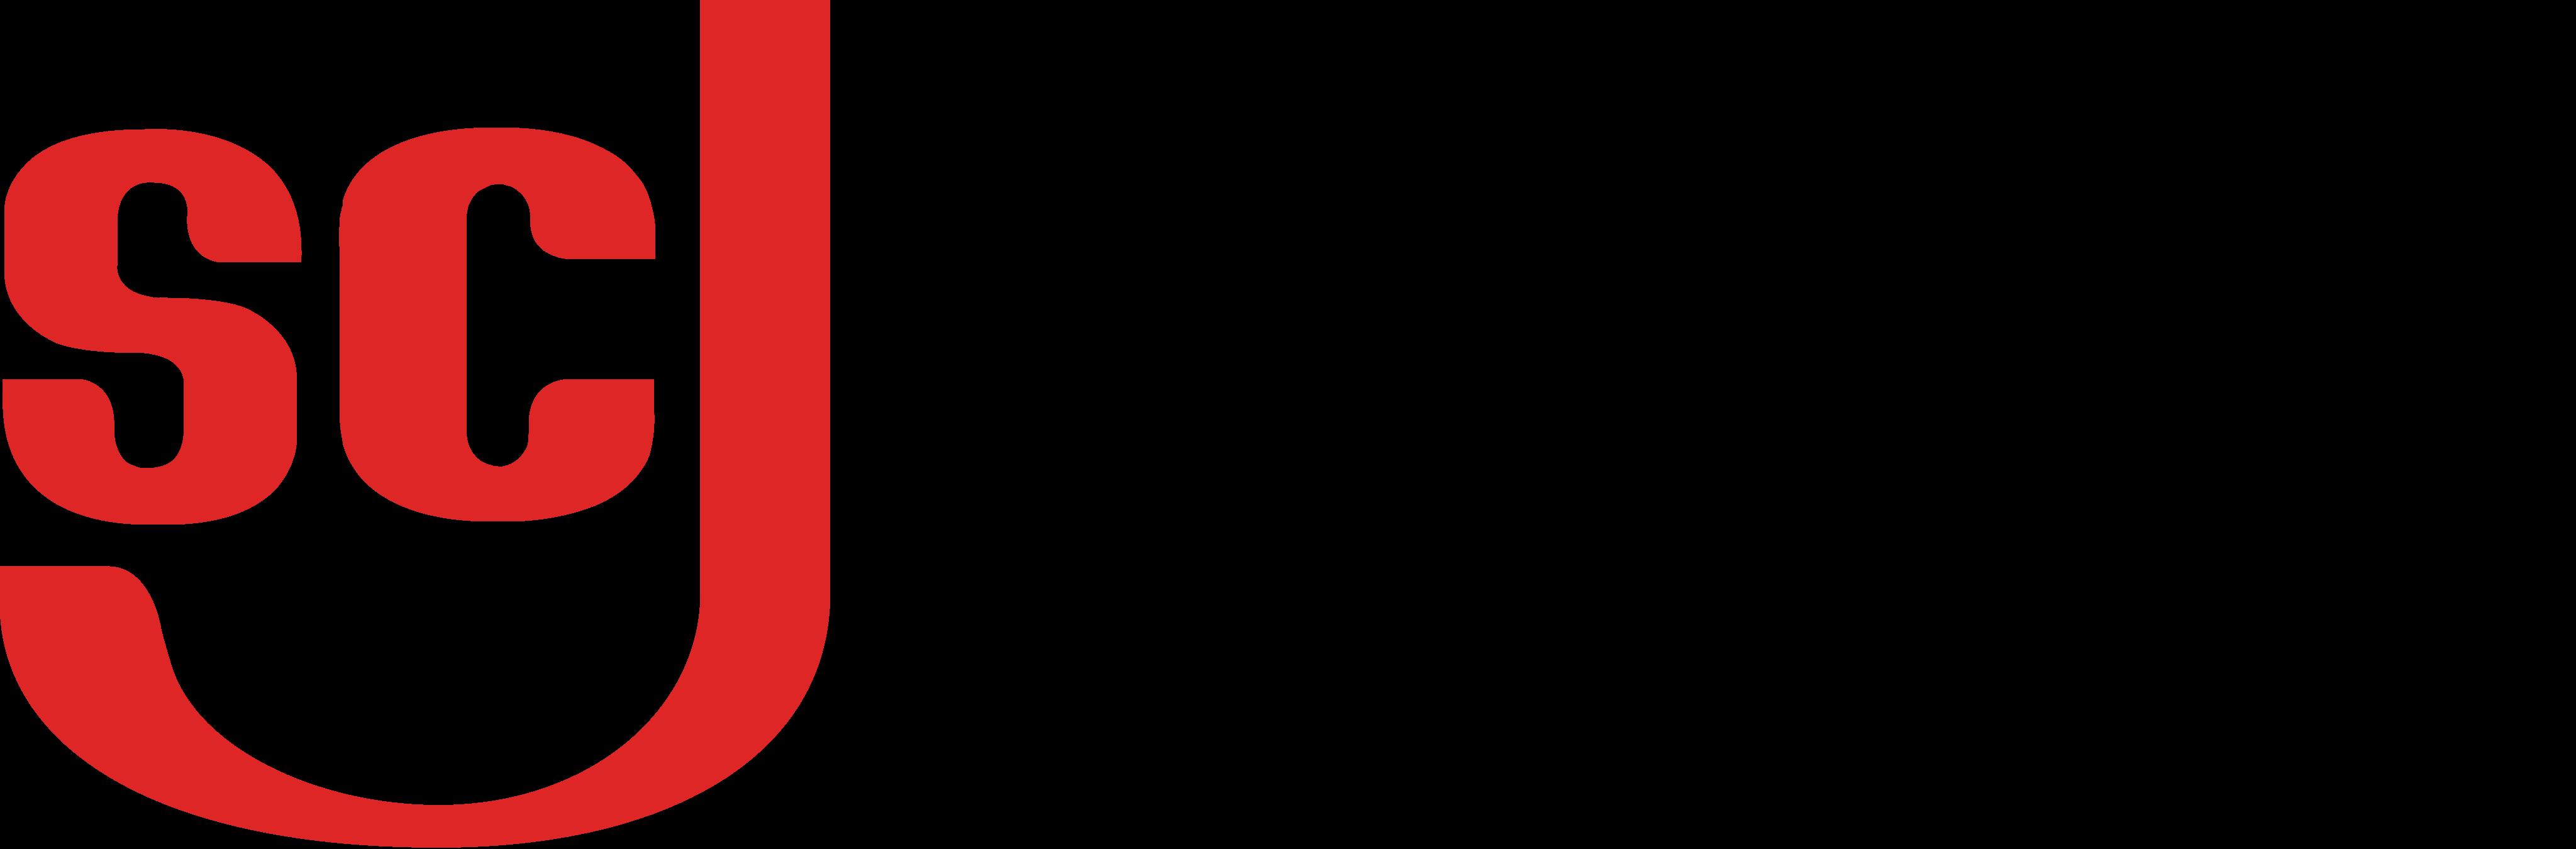 sc johnson logo 1 - SC Johnson Logo